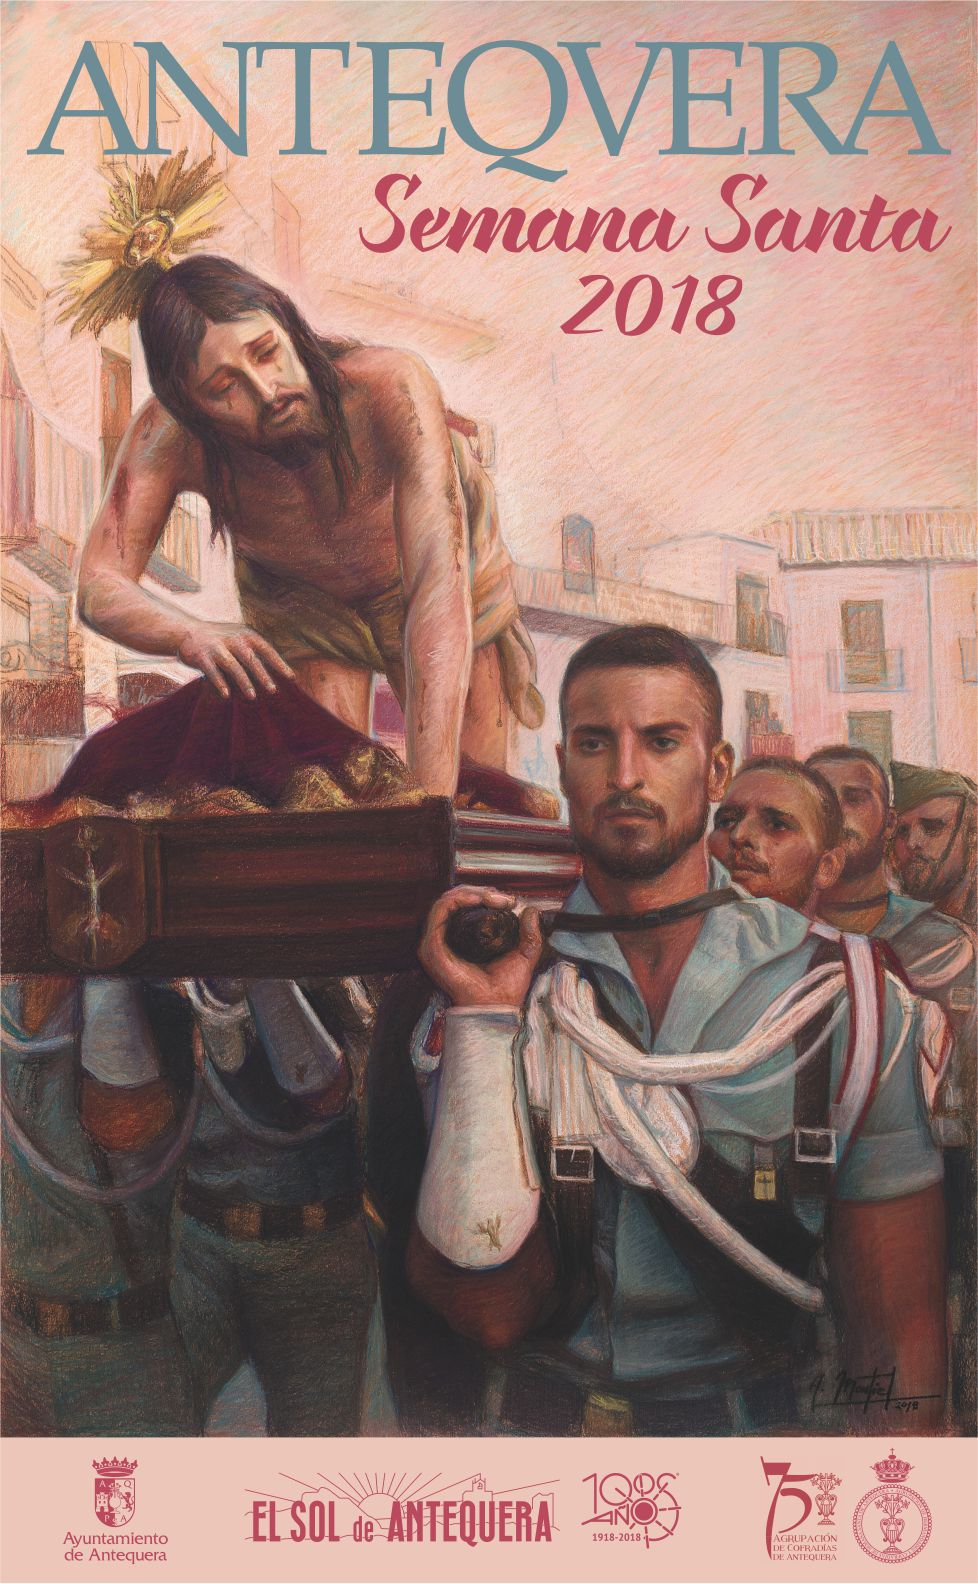 Cartel SSanta Antequera 2018 RRSS (1) (1)